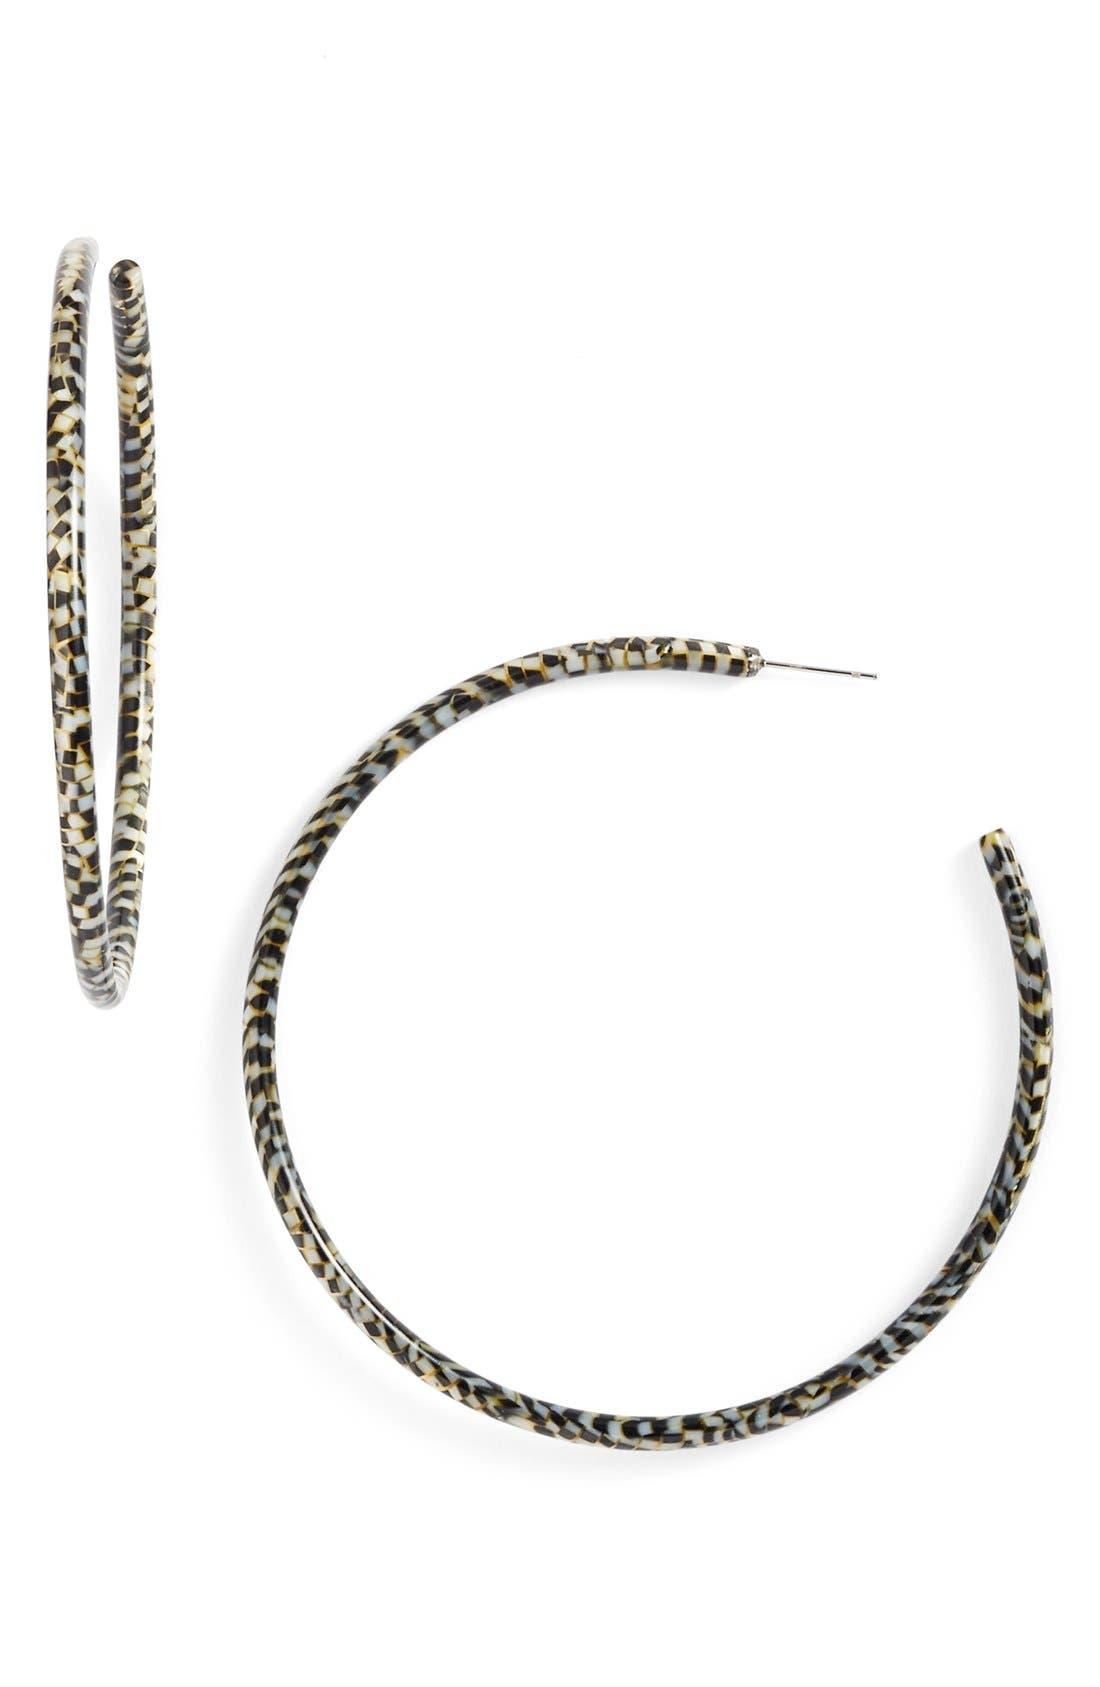 Main Image - L Erickson 'Jumbo' Hoop Earrings